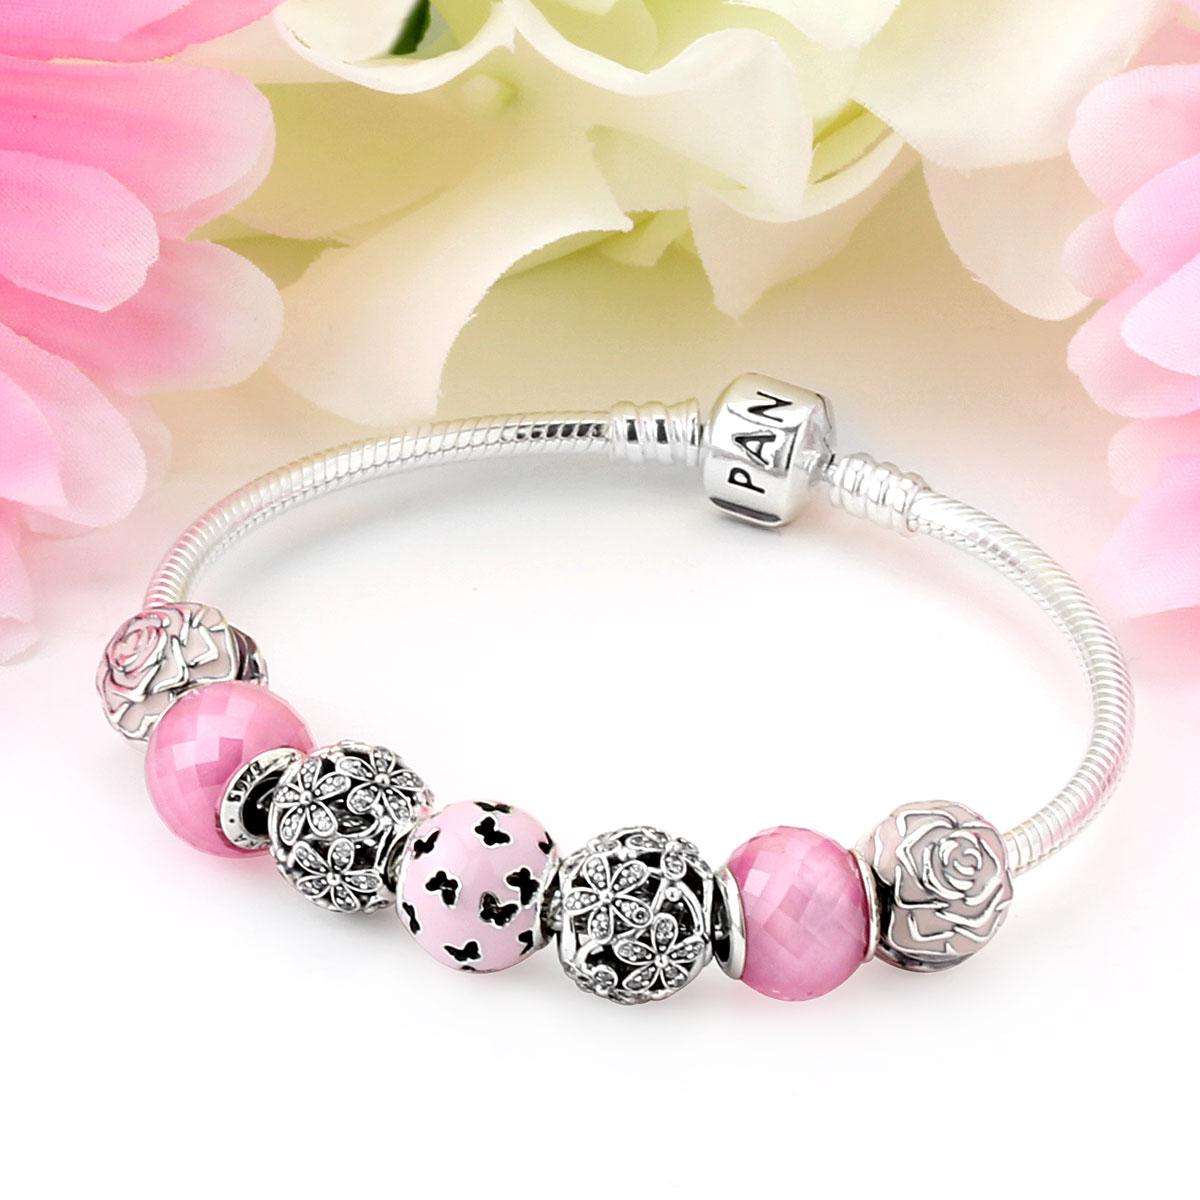 Pandora Bracelet Design Ideas pandora bangle charm bracelet bracelets bangles design ideas Pandora Designer Bracelets